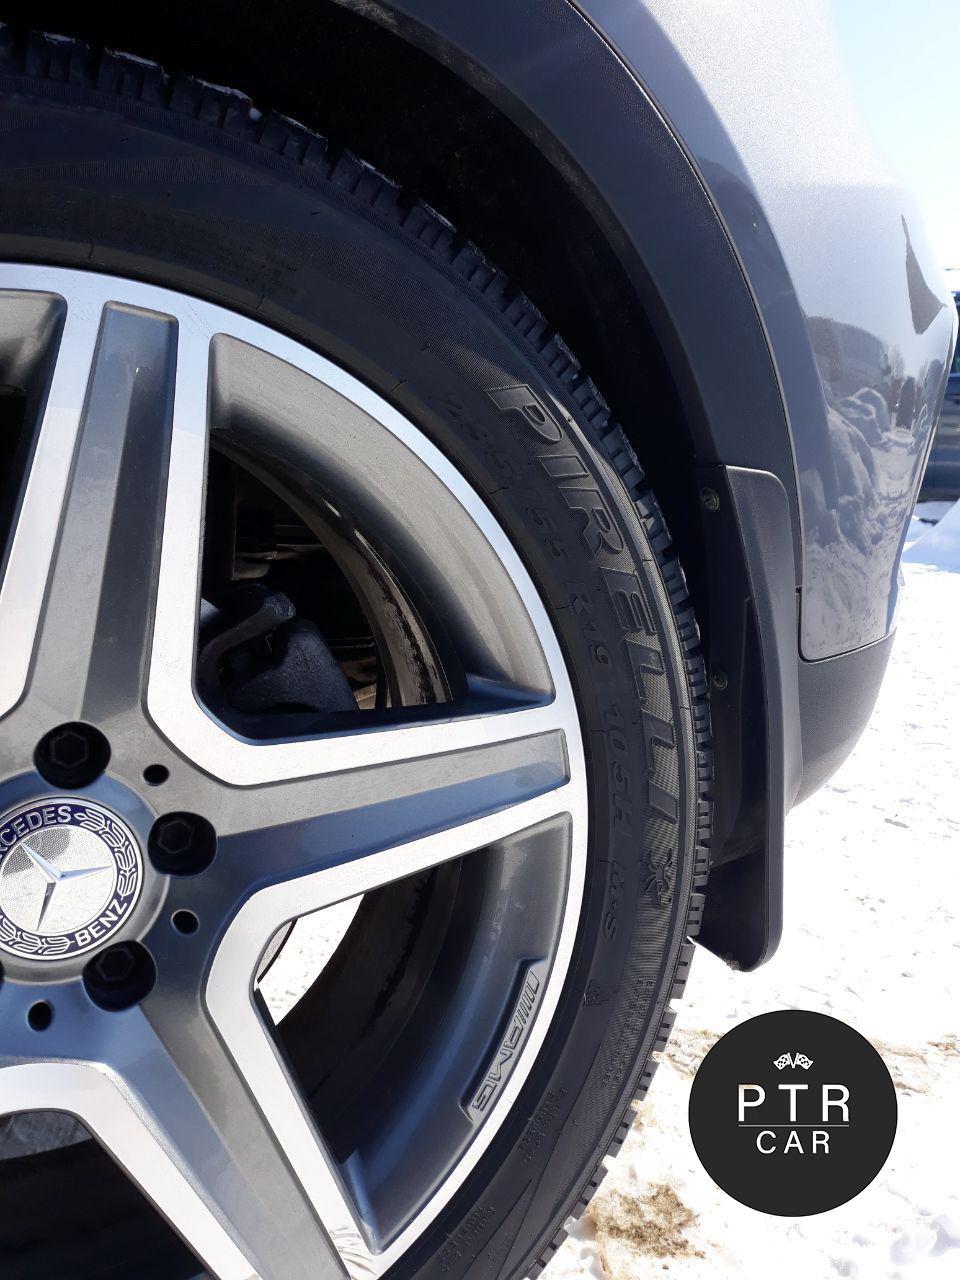 Брызговики Mercedes-Benz ML/GLE 166 (с порогами) 2011-